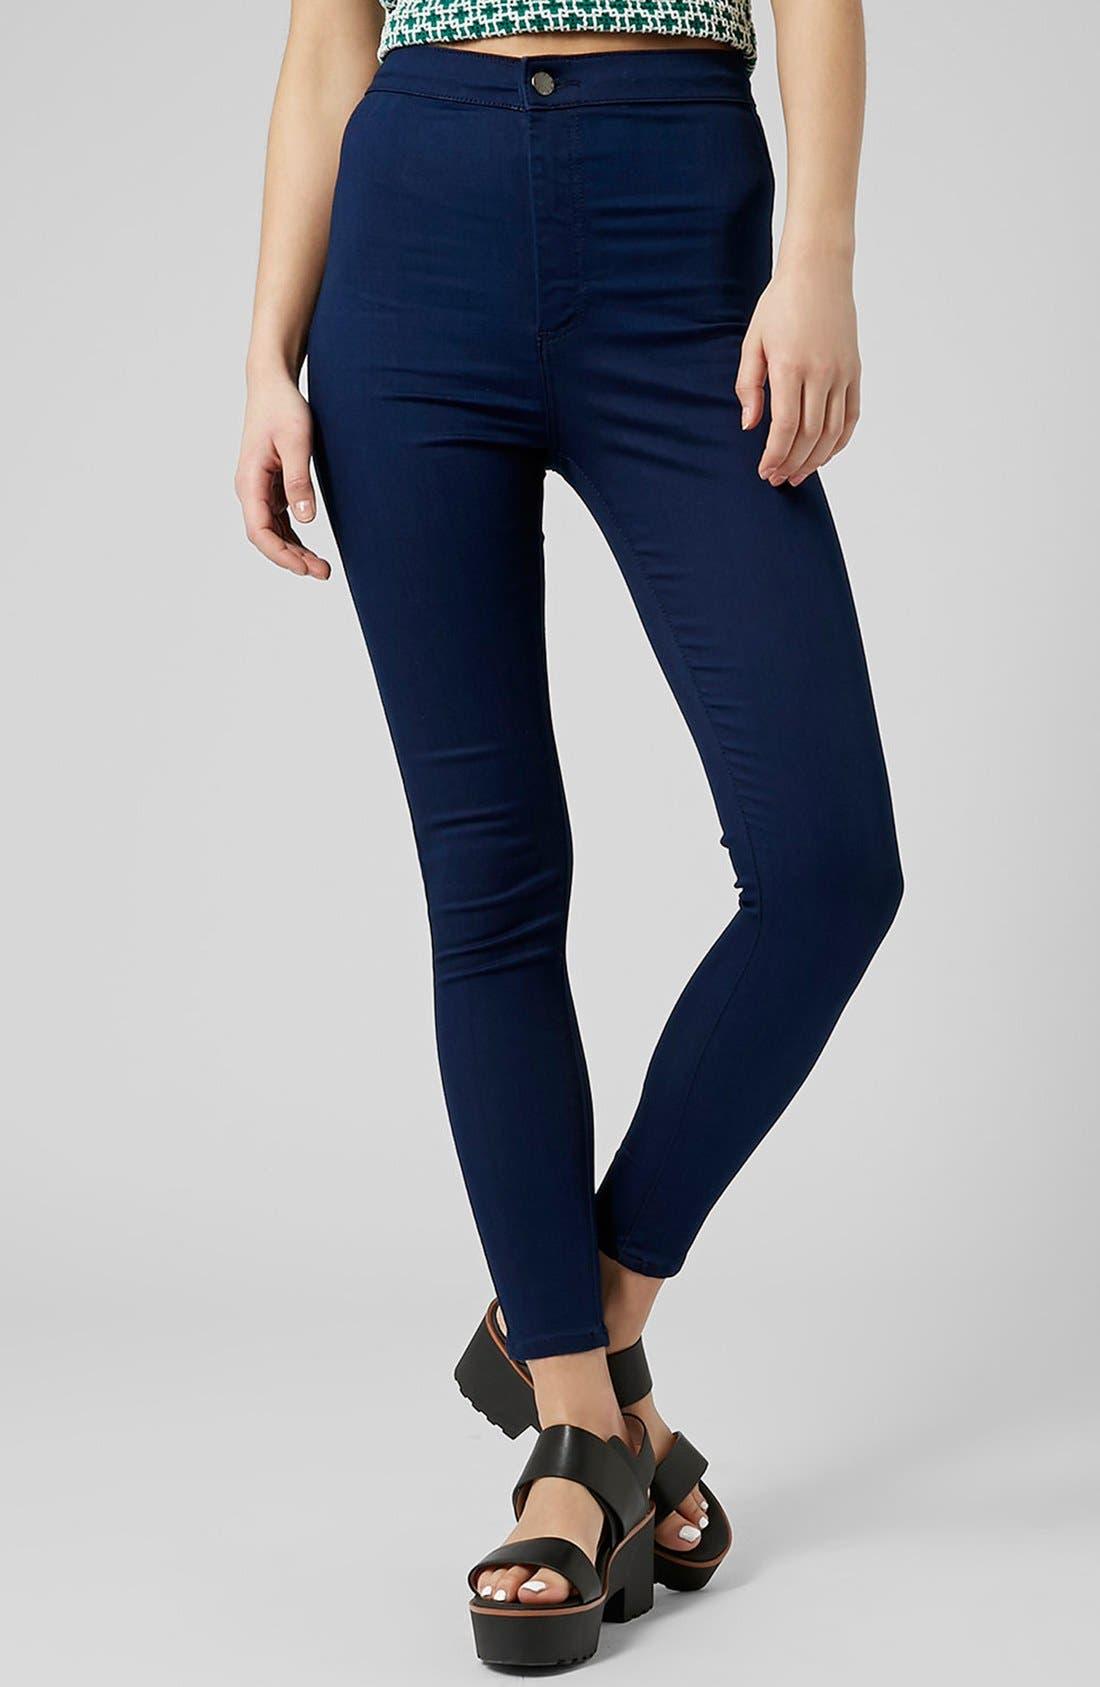 Alternate Image 1 Selected - Topshop Moto 'Joni' High Rise Skinny Jeans (Bright Blue)